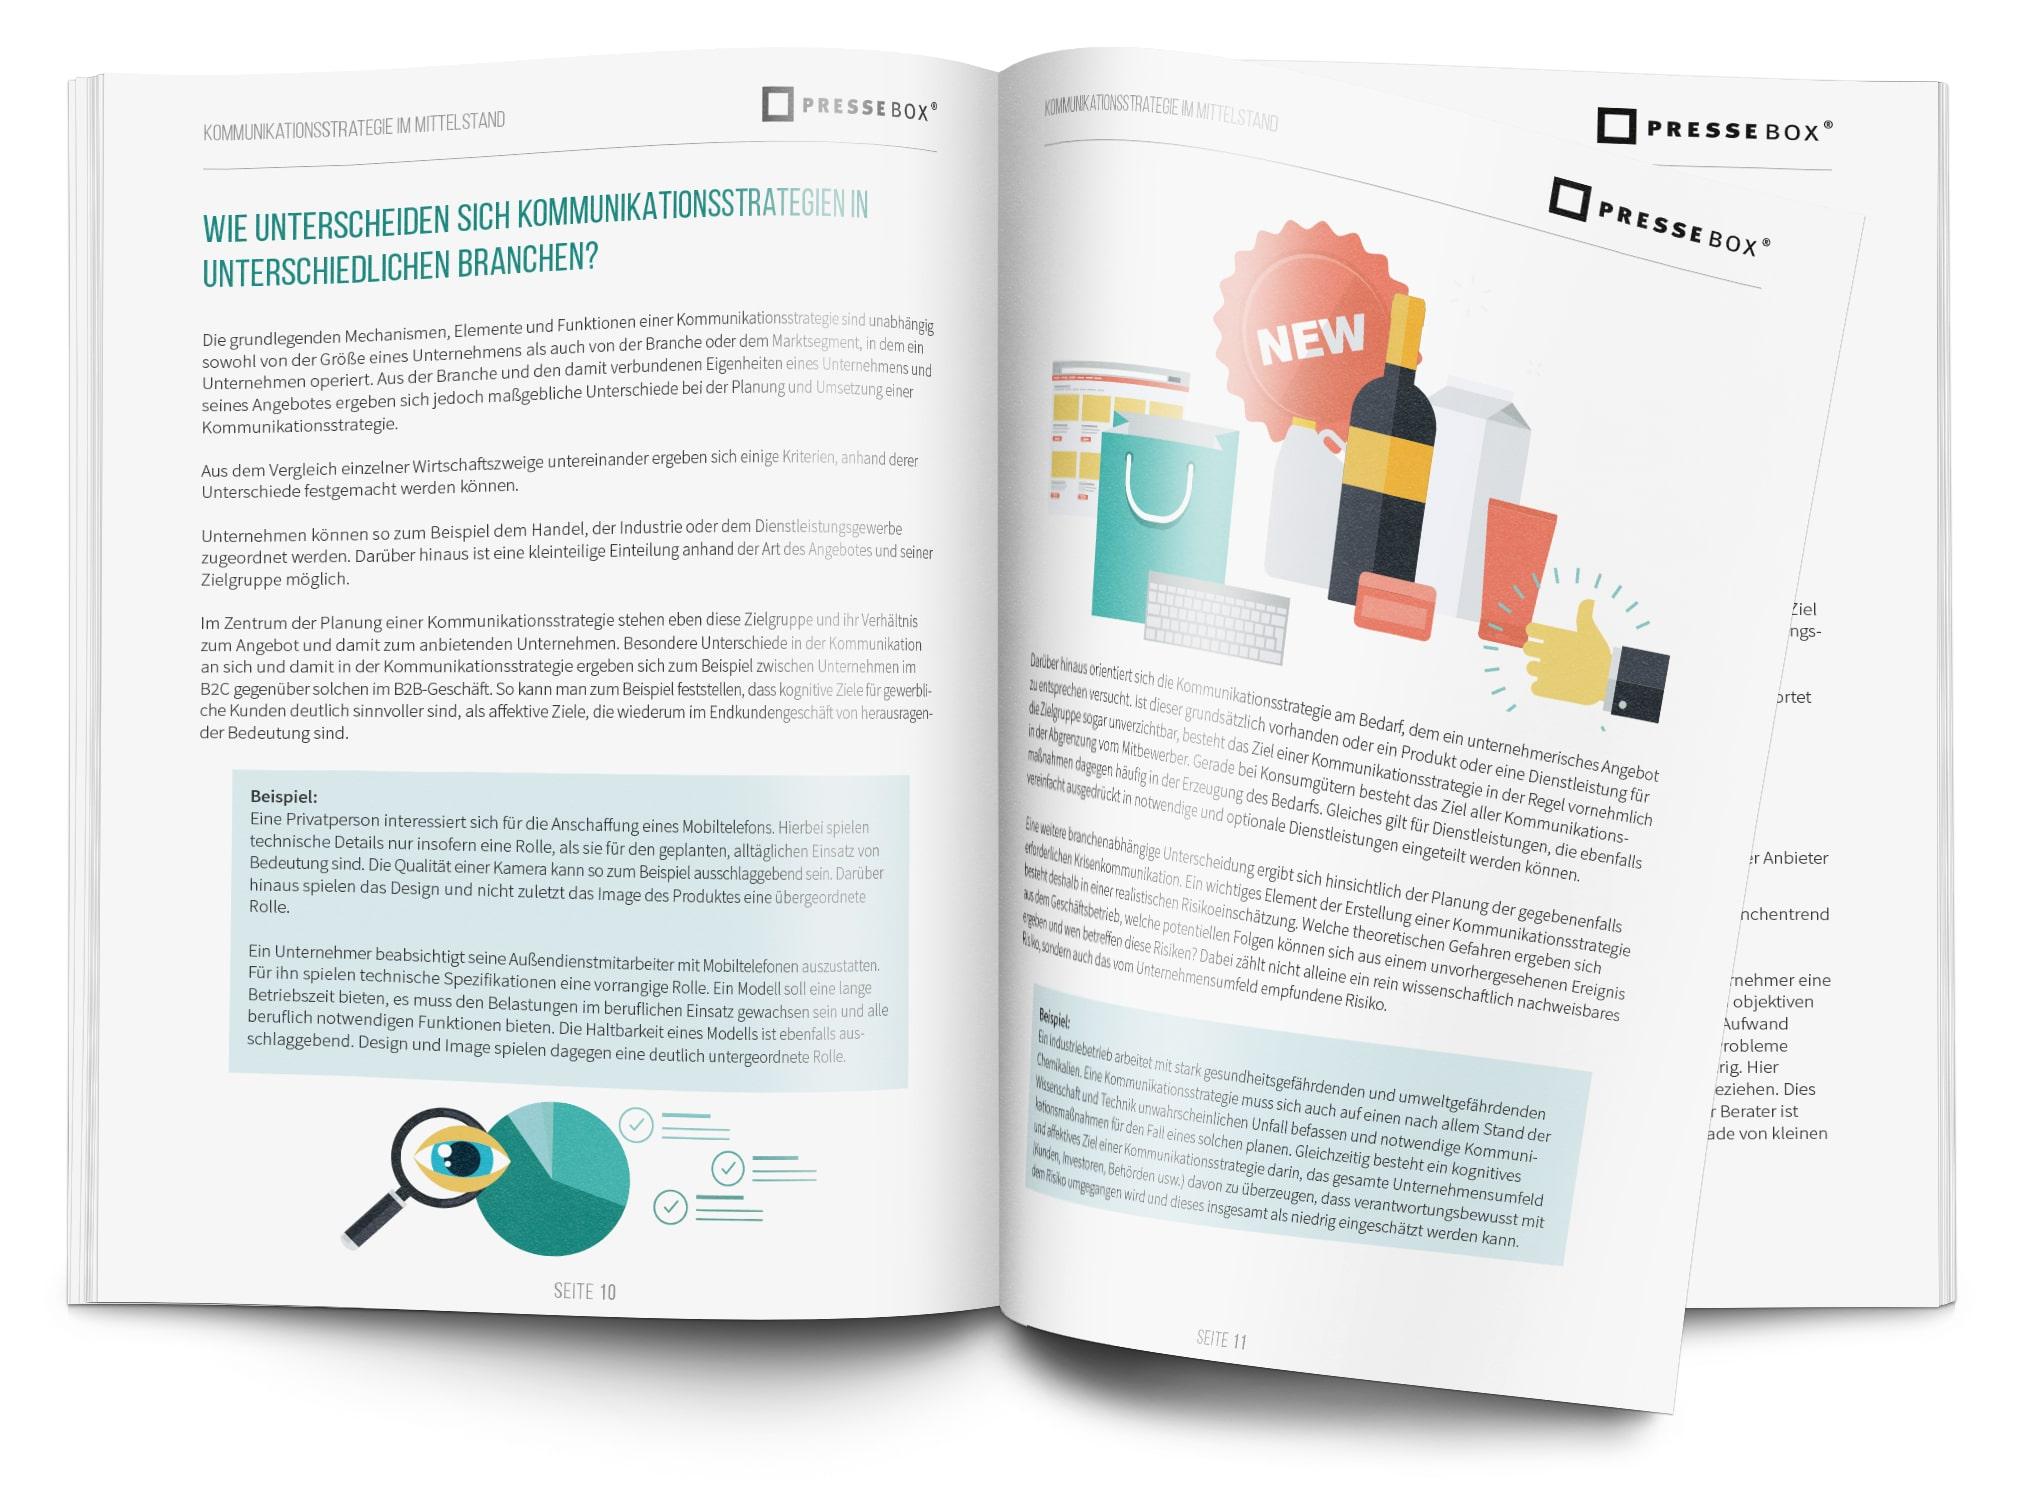 Mockup Kommunikationsstrategie im Mittelstand